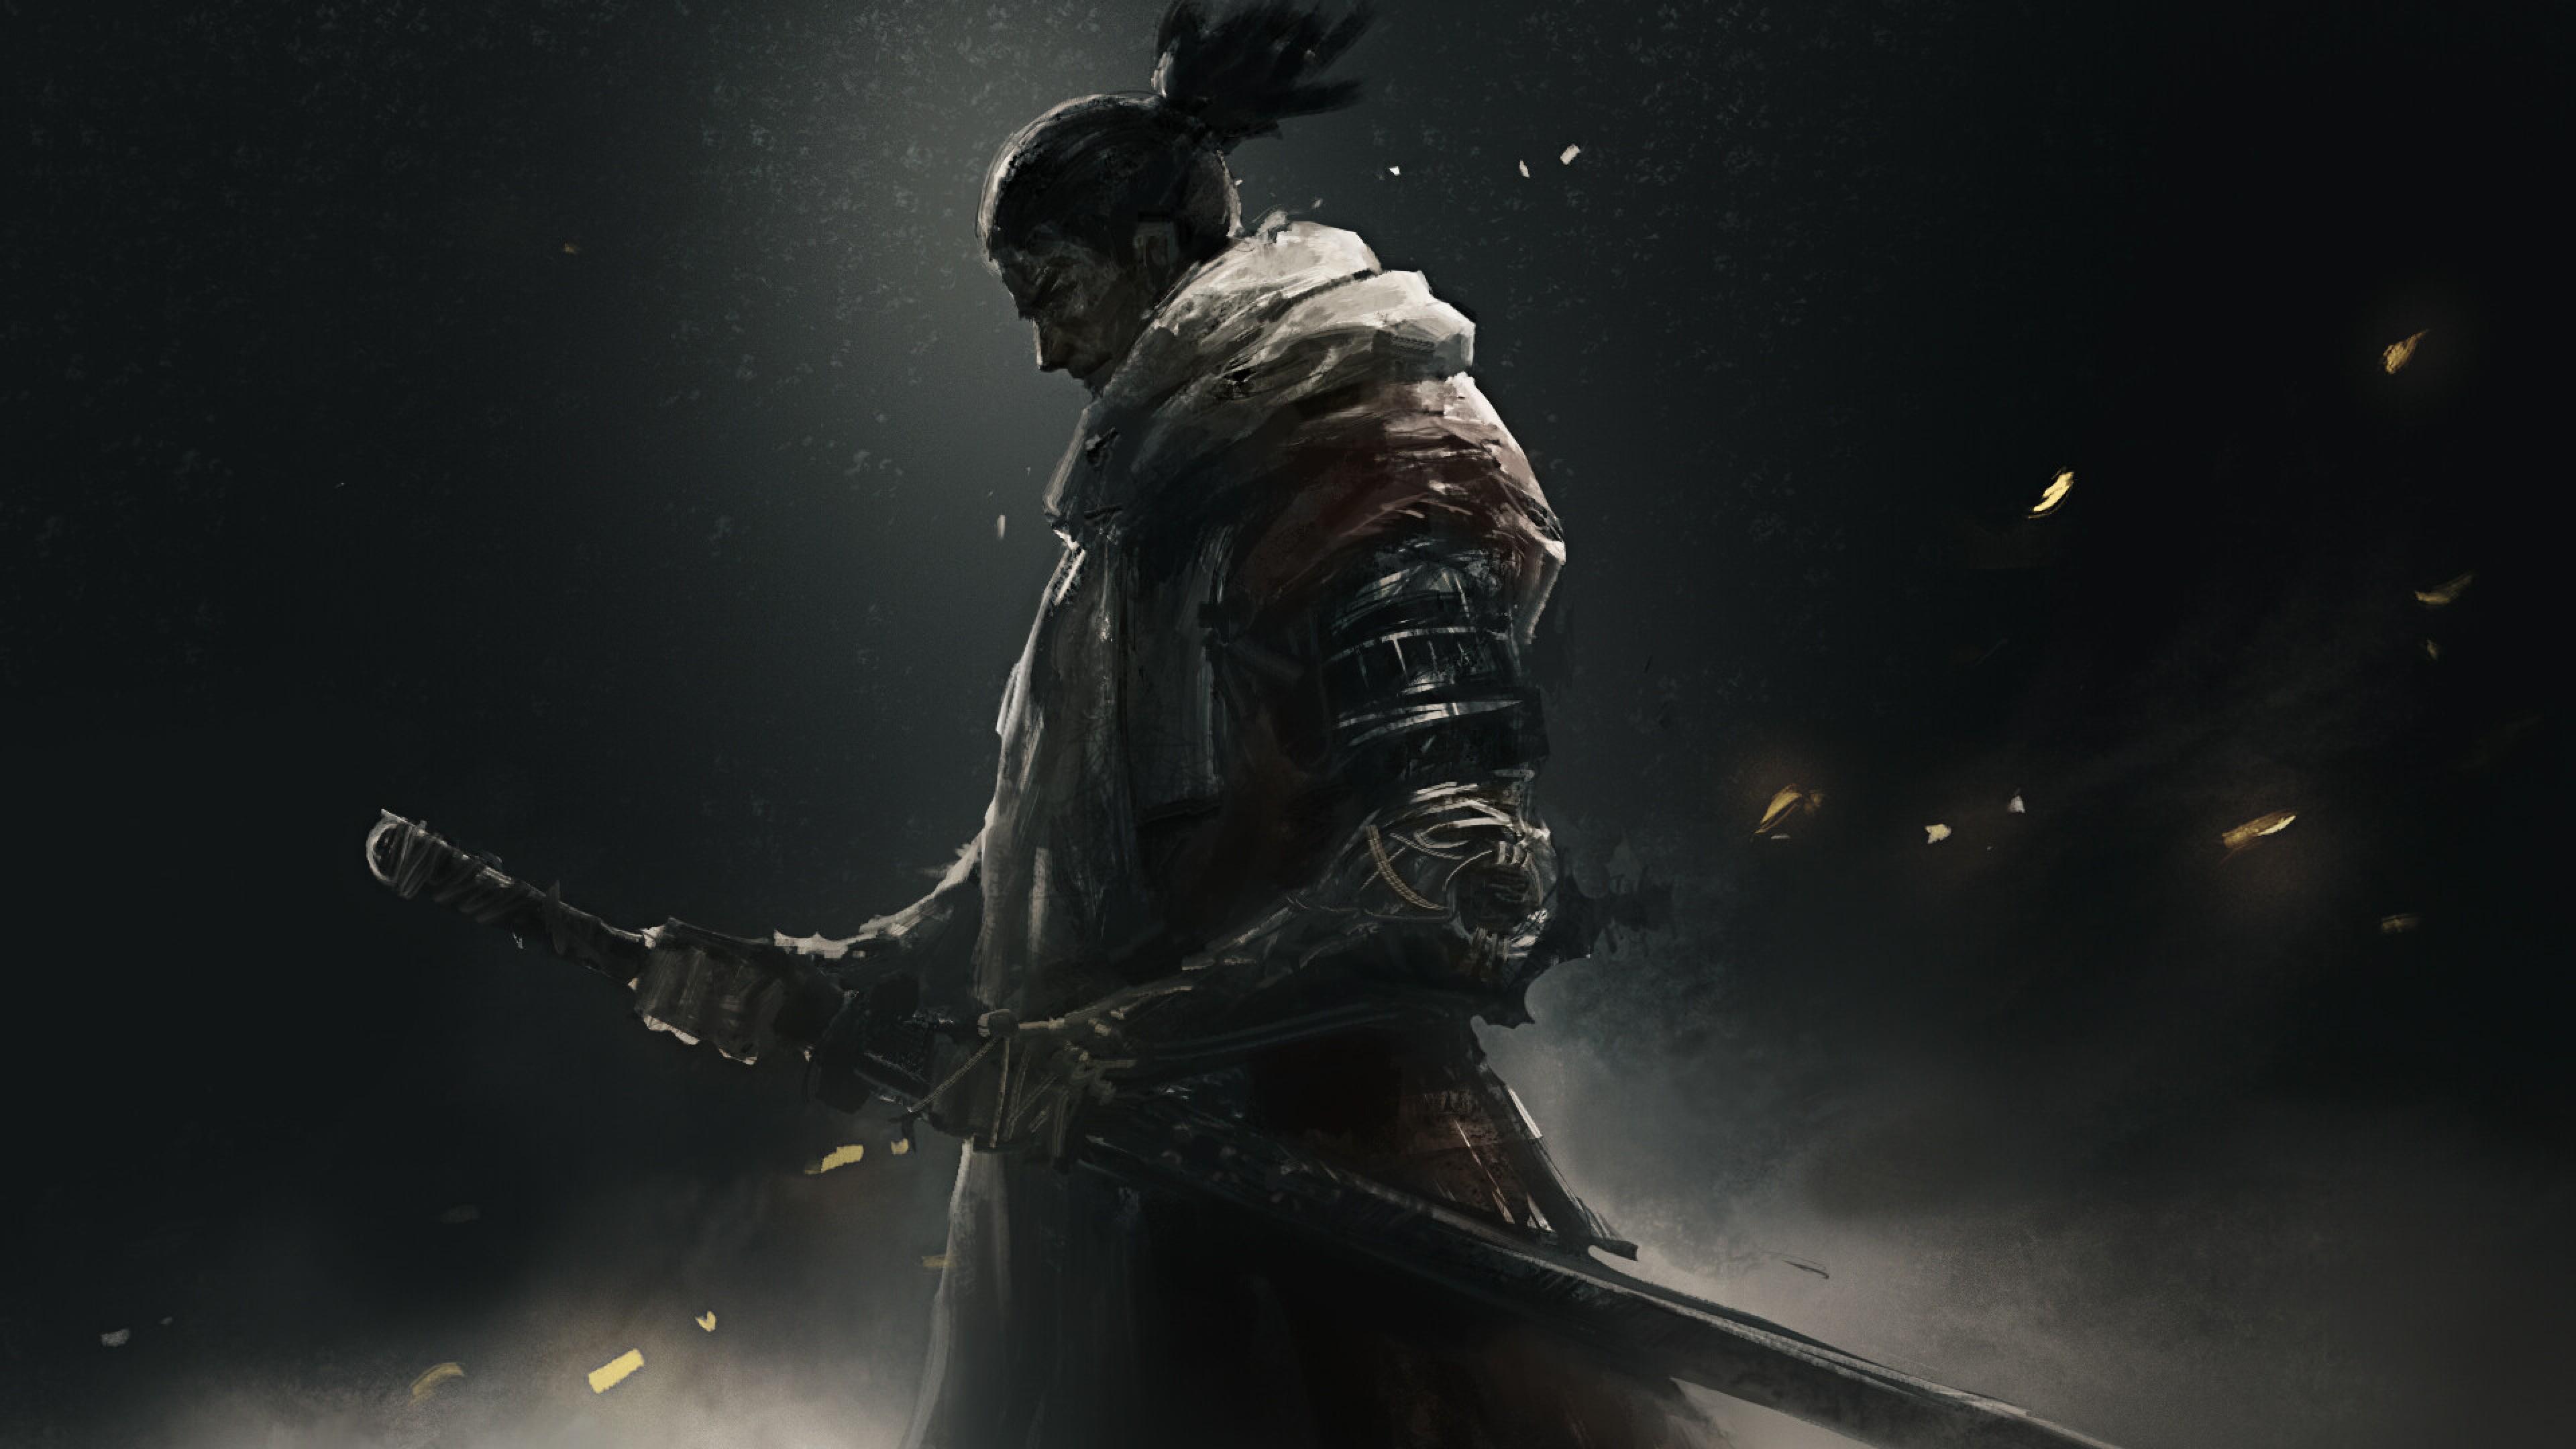 3840x2160 Sekiro Shadows Die Twice Warrior 4k Wallpaper Hd Games